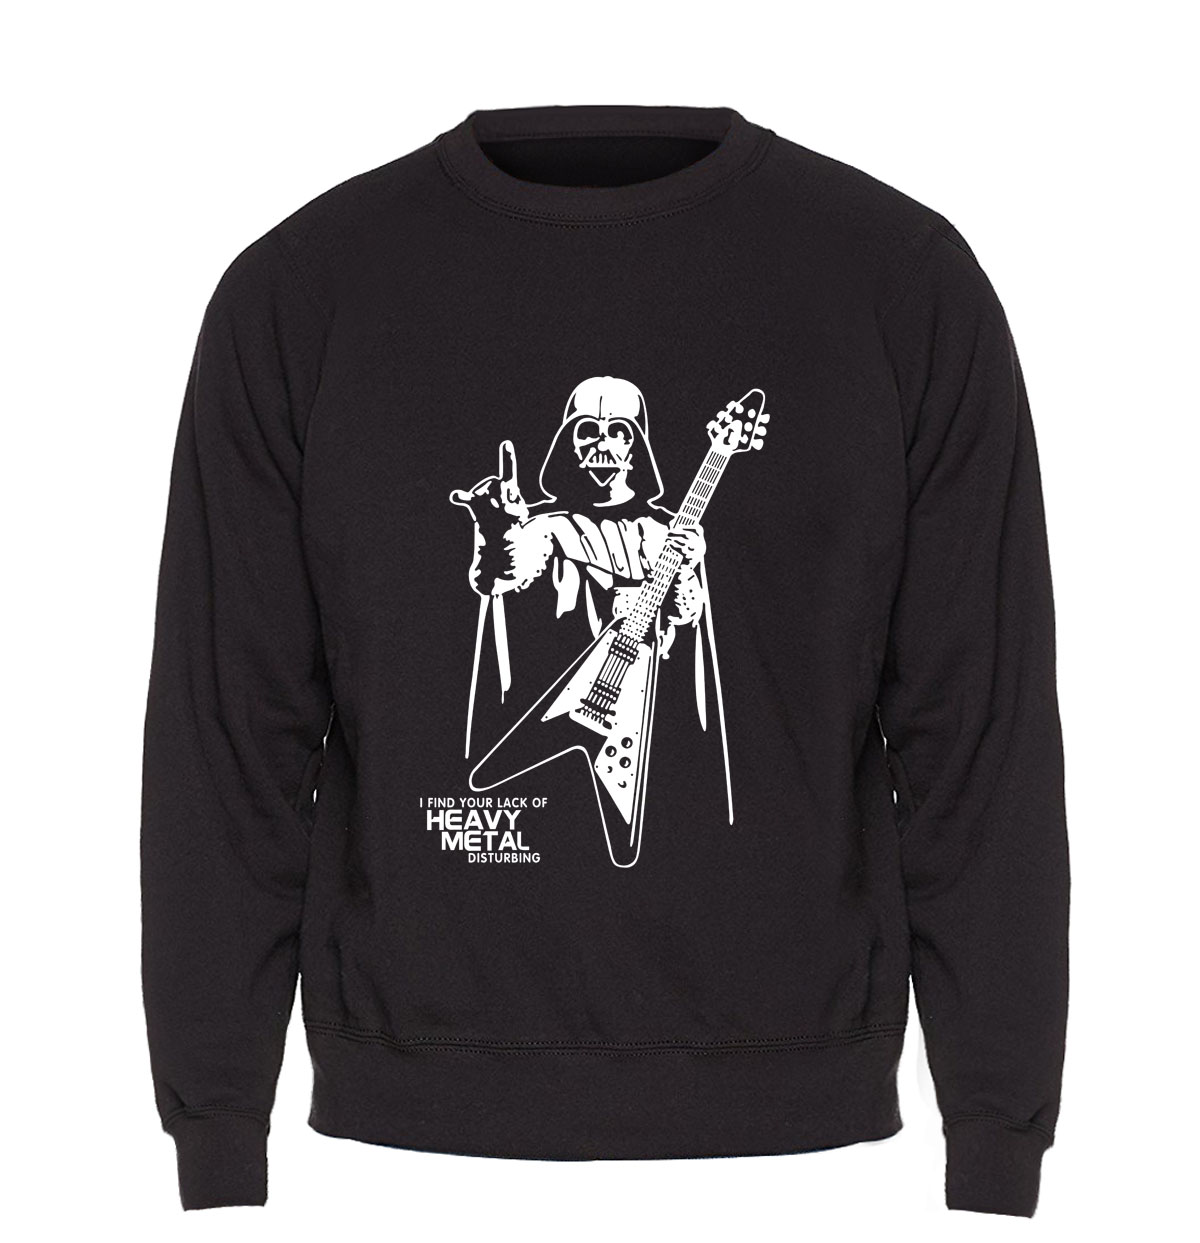 Star Wars Hoodie Darth Vader Sweatshirt Men Heavy Metal Designer Funny Sweatshirts Winter Autumn Fleece Warm Streetwear Homme